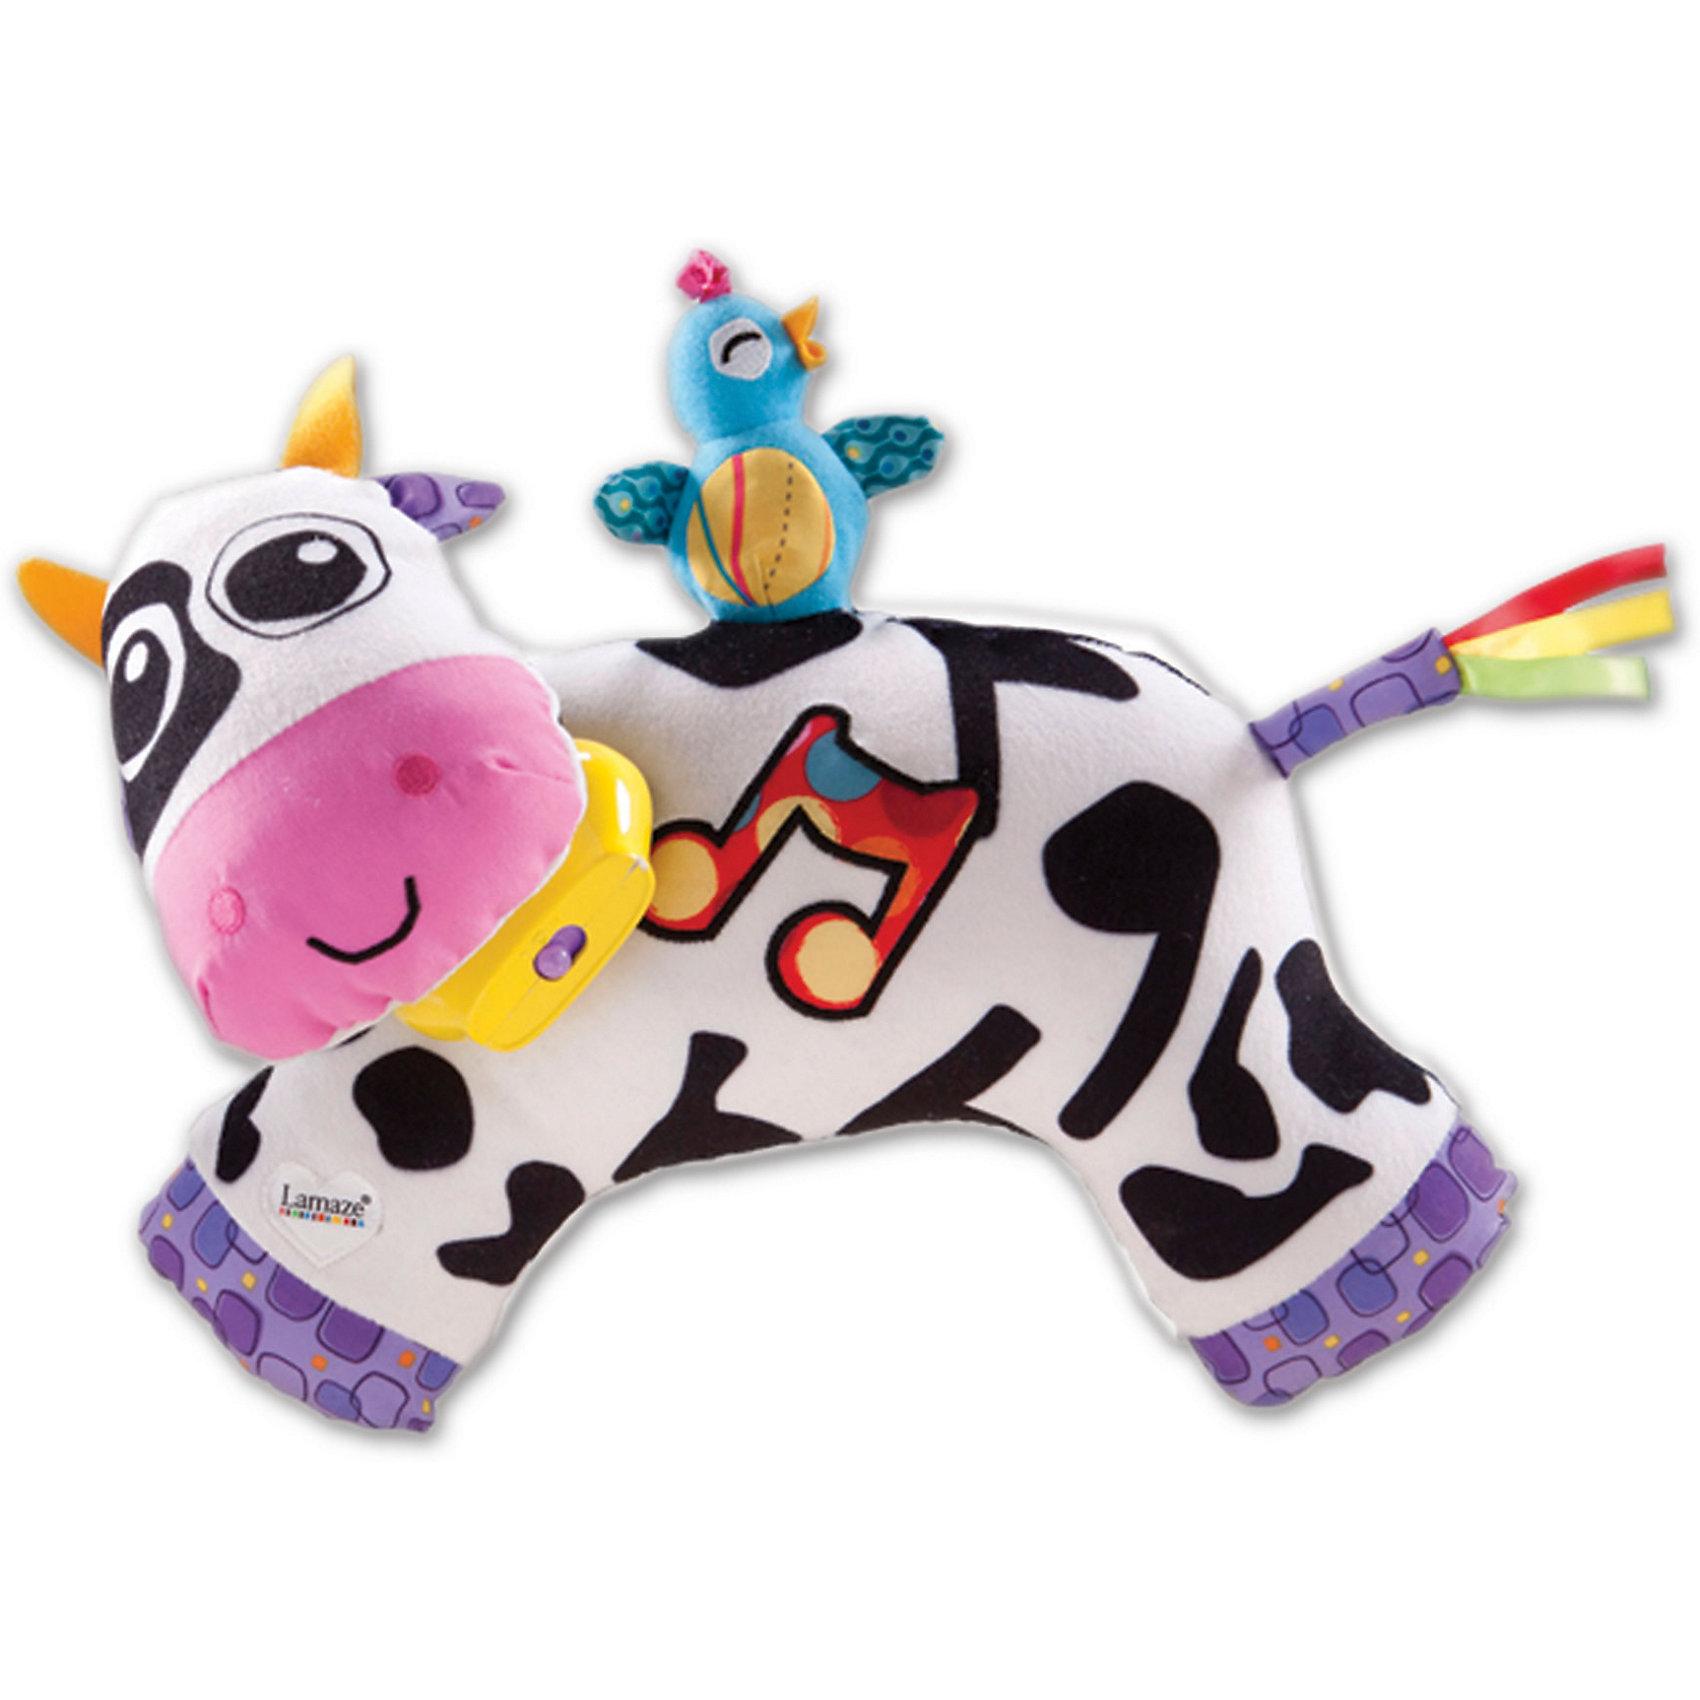 TOMY Мягкая игрушка Музыкальная Коровка, звук-мелодия, Tomy Lamaze мягкие игрушки tomy музыкальная мягкая игрушка музыкальная коровка